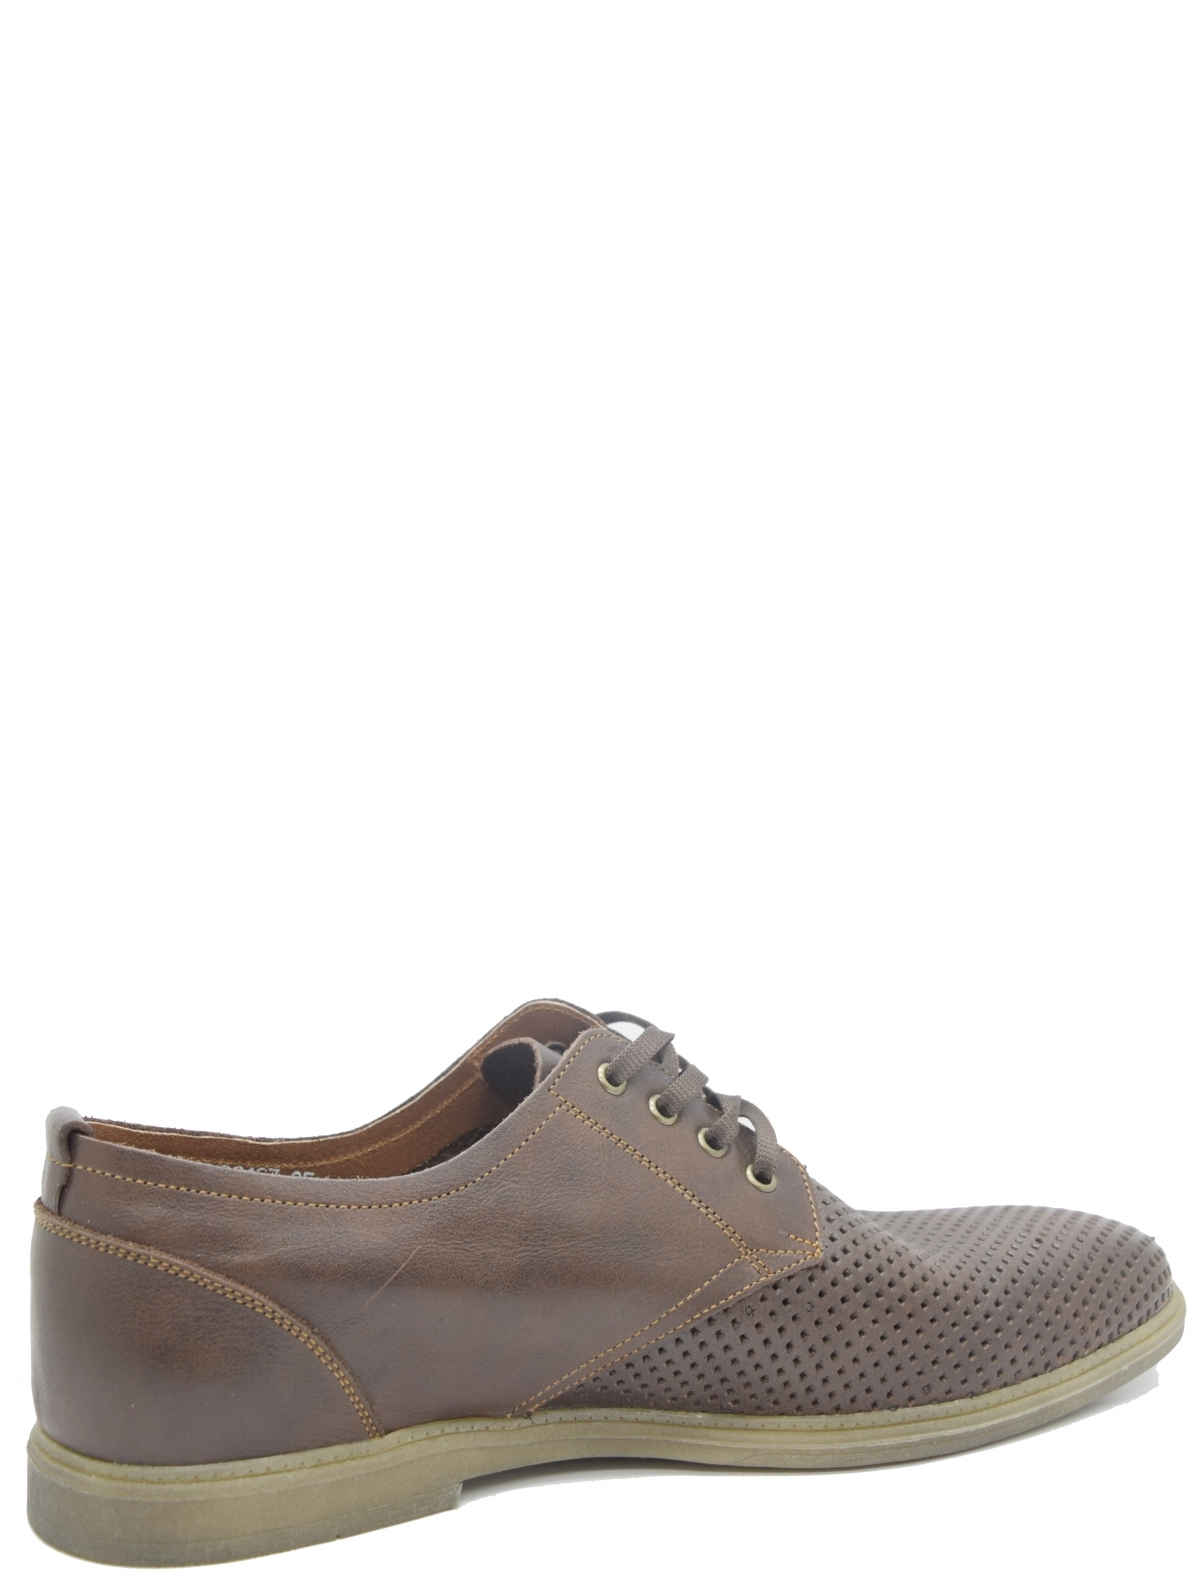 Rooman 904-103-L2L мужские туфли